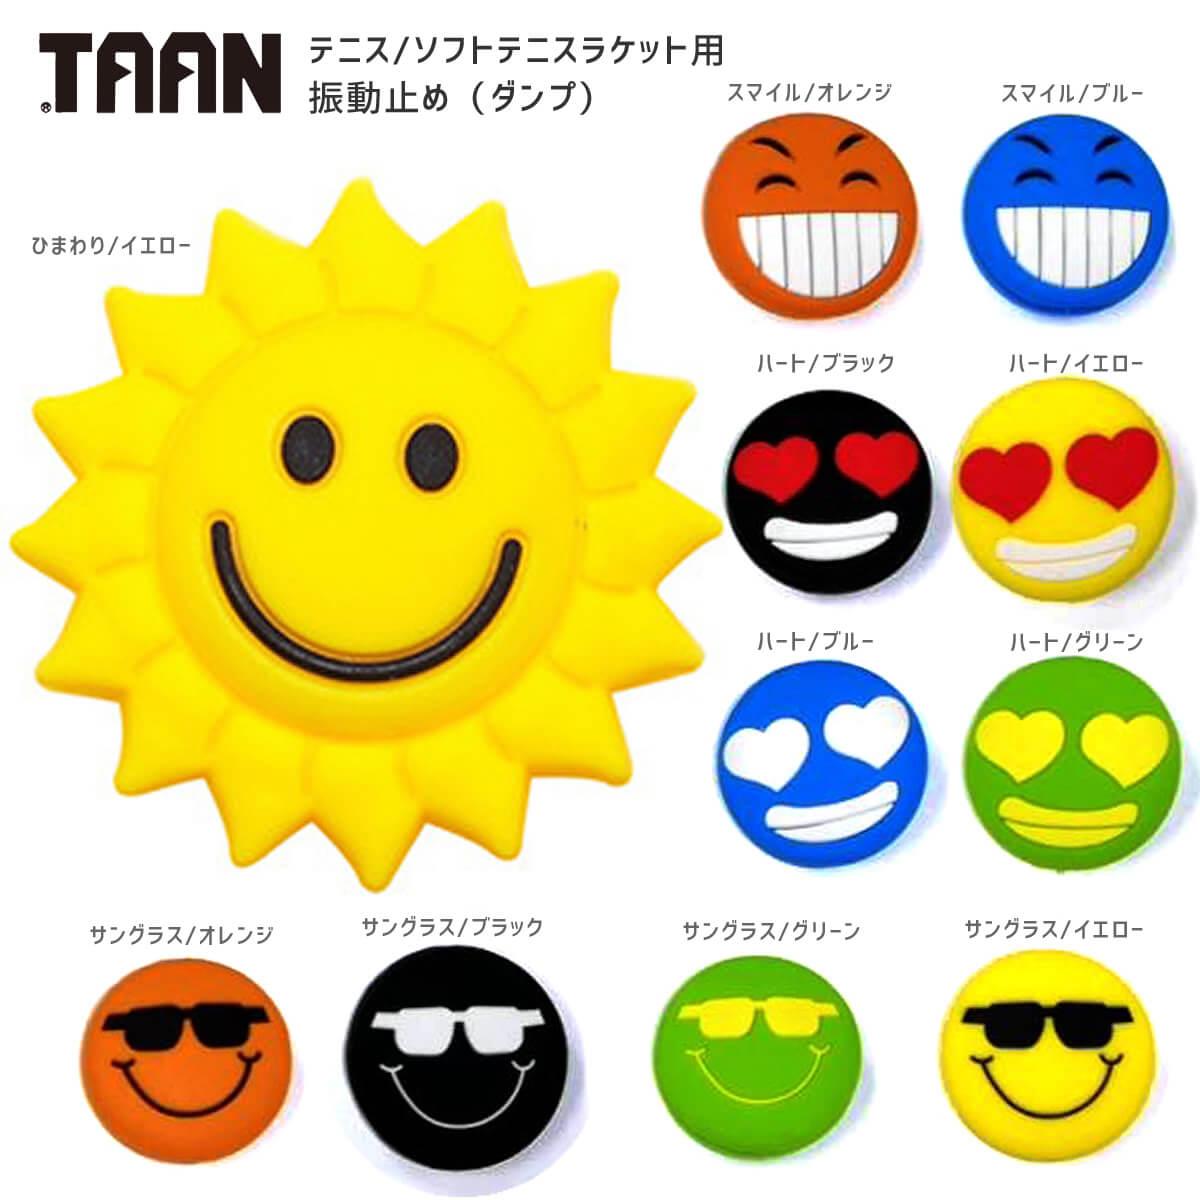 TAAN 振動止め ダンプ ダンパー 可愛いキャラクター タアン テニスアクセサリー 最安値に挑戦 メール便可 5☆好評 衝撃吸収